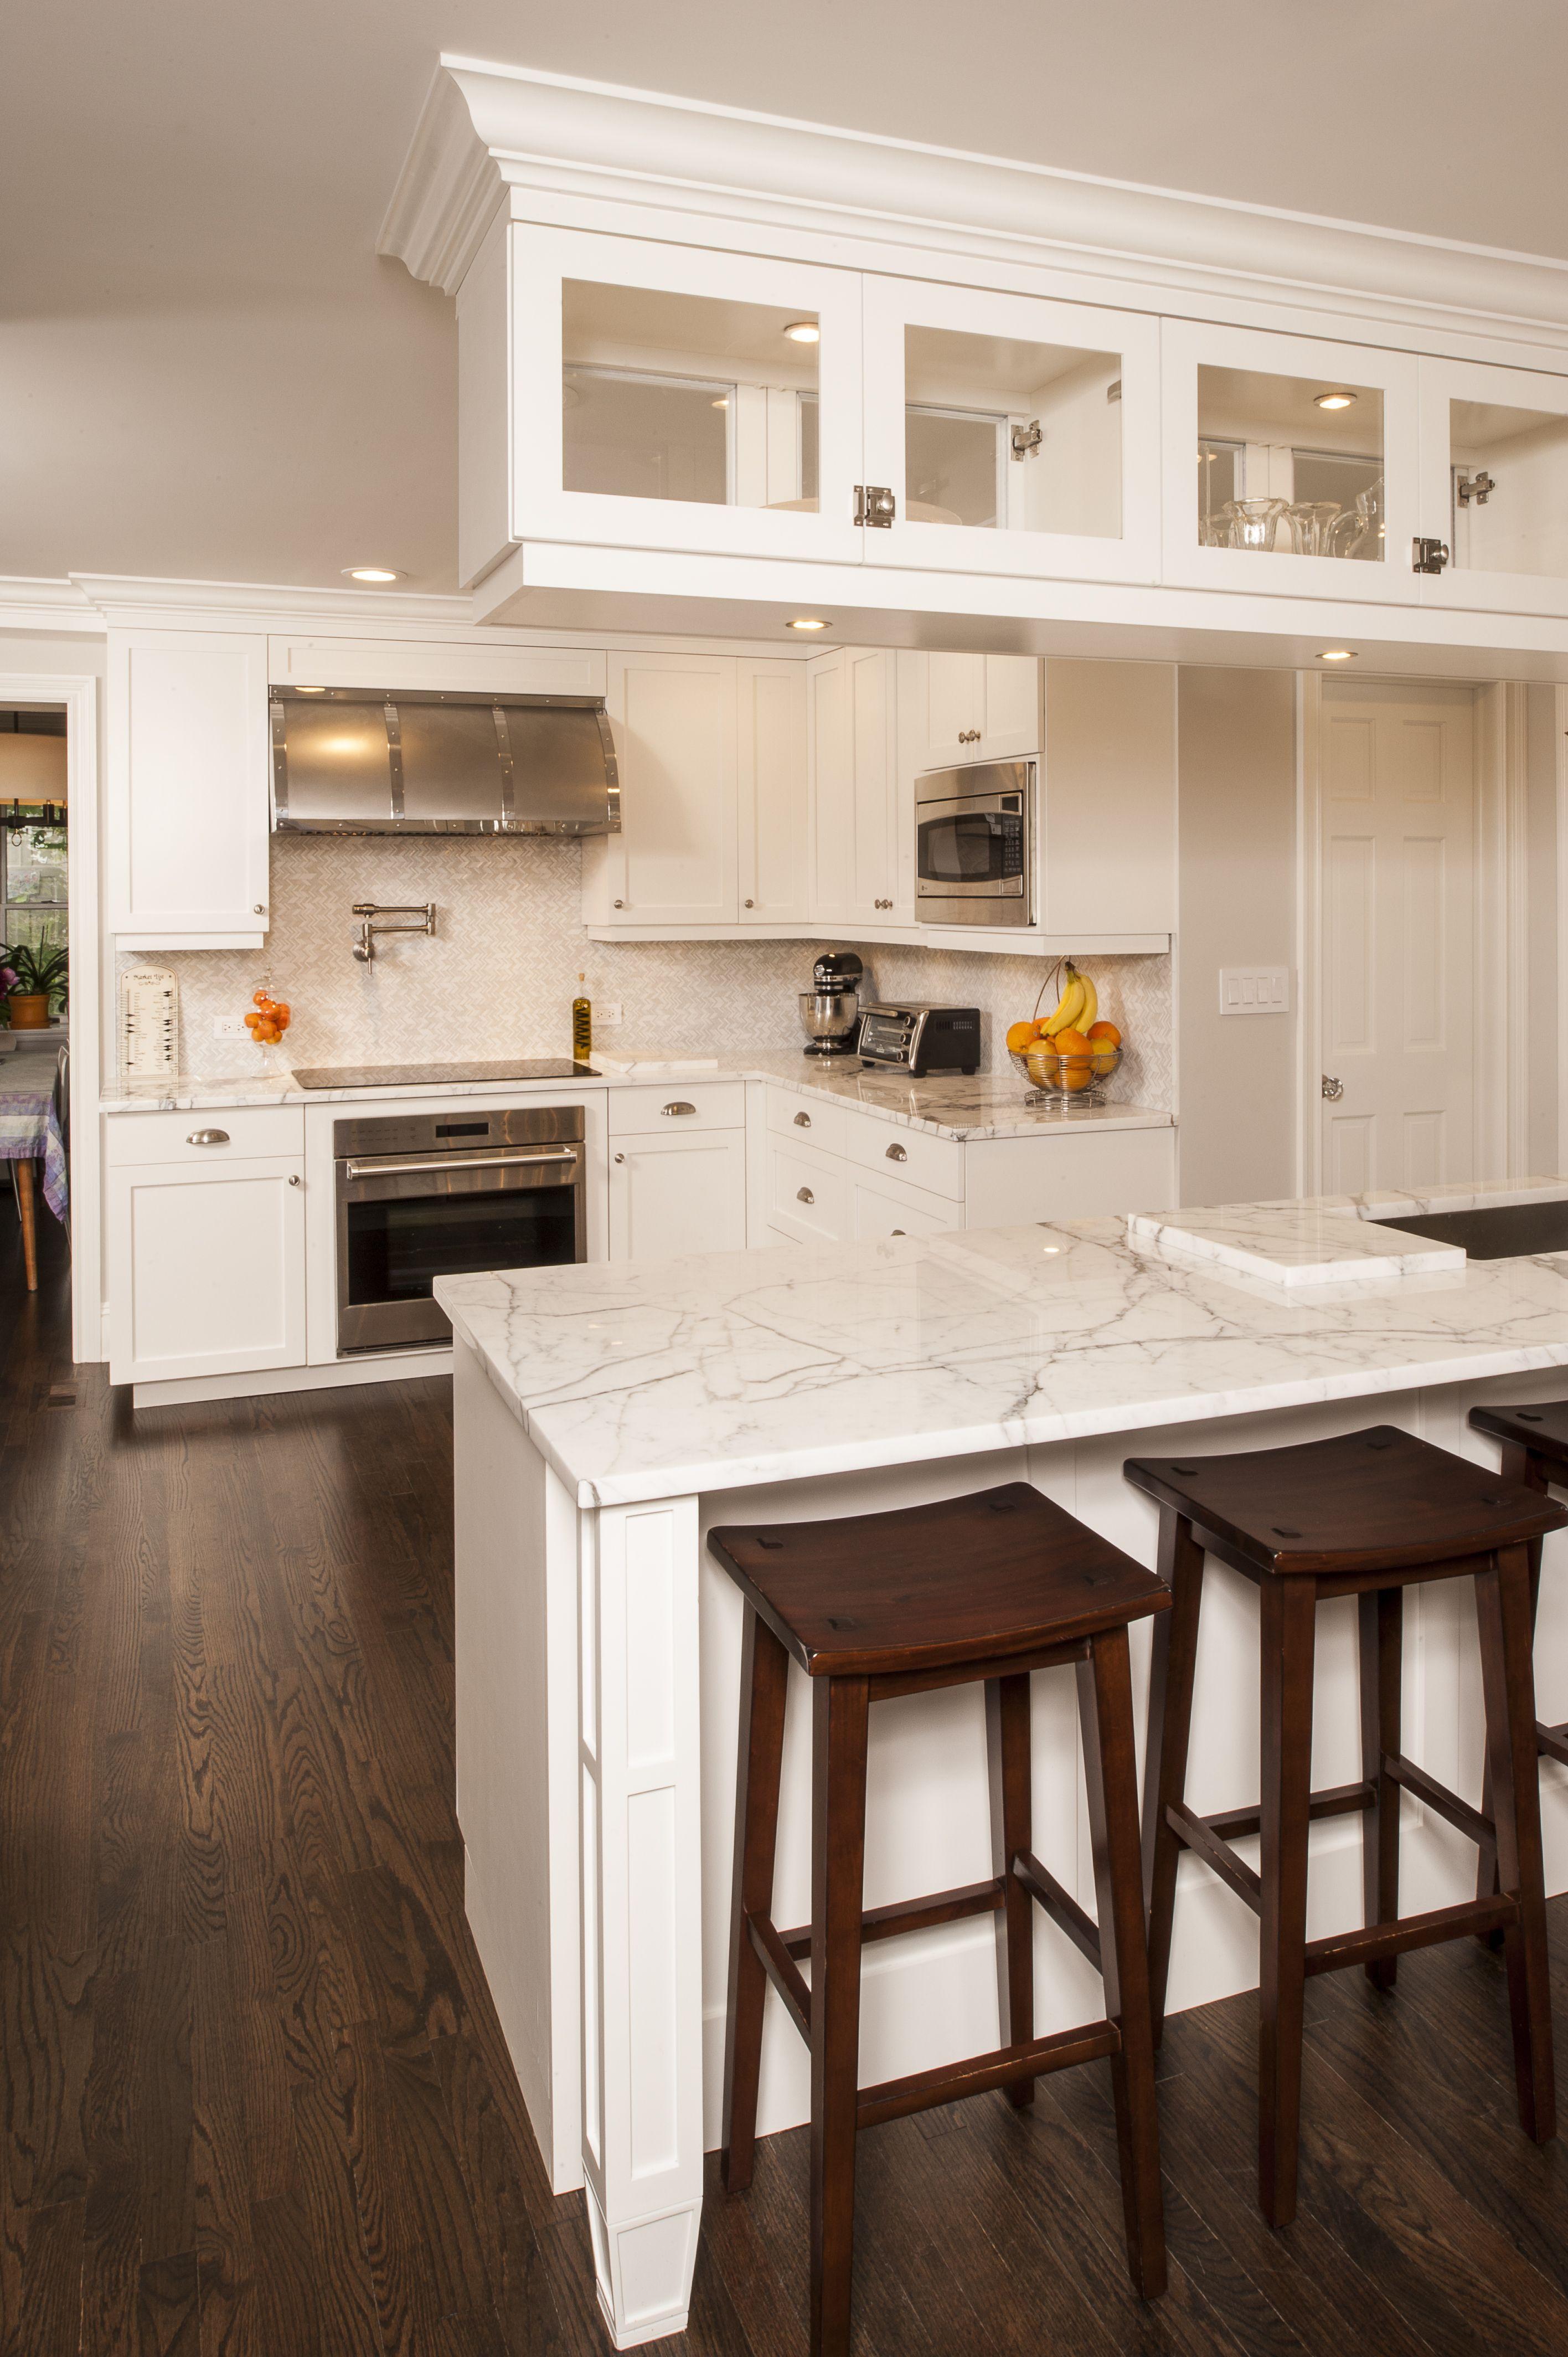 White Kitchen With Peninsula And Glass Display Cabinets Longislandkitchen Longislandluxuryk Classic Kitchens Shaker Style Kitchens Marble Countertops Kitchen White kitchen with peninsula